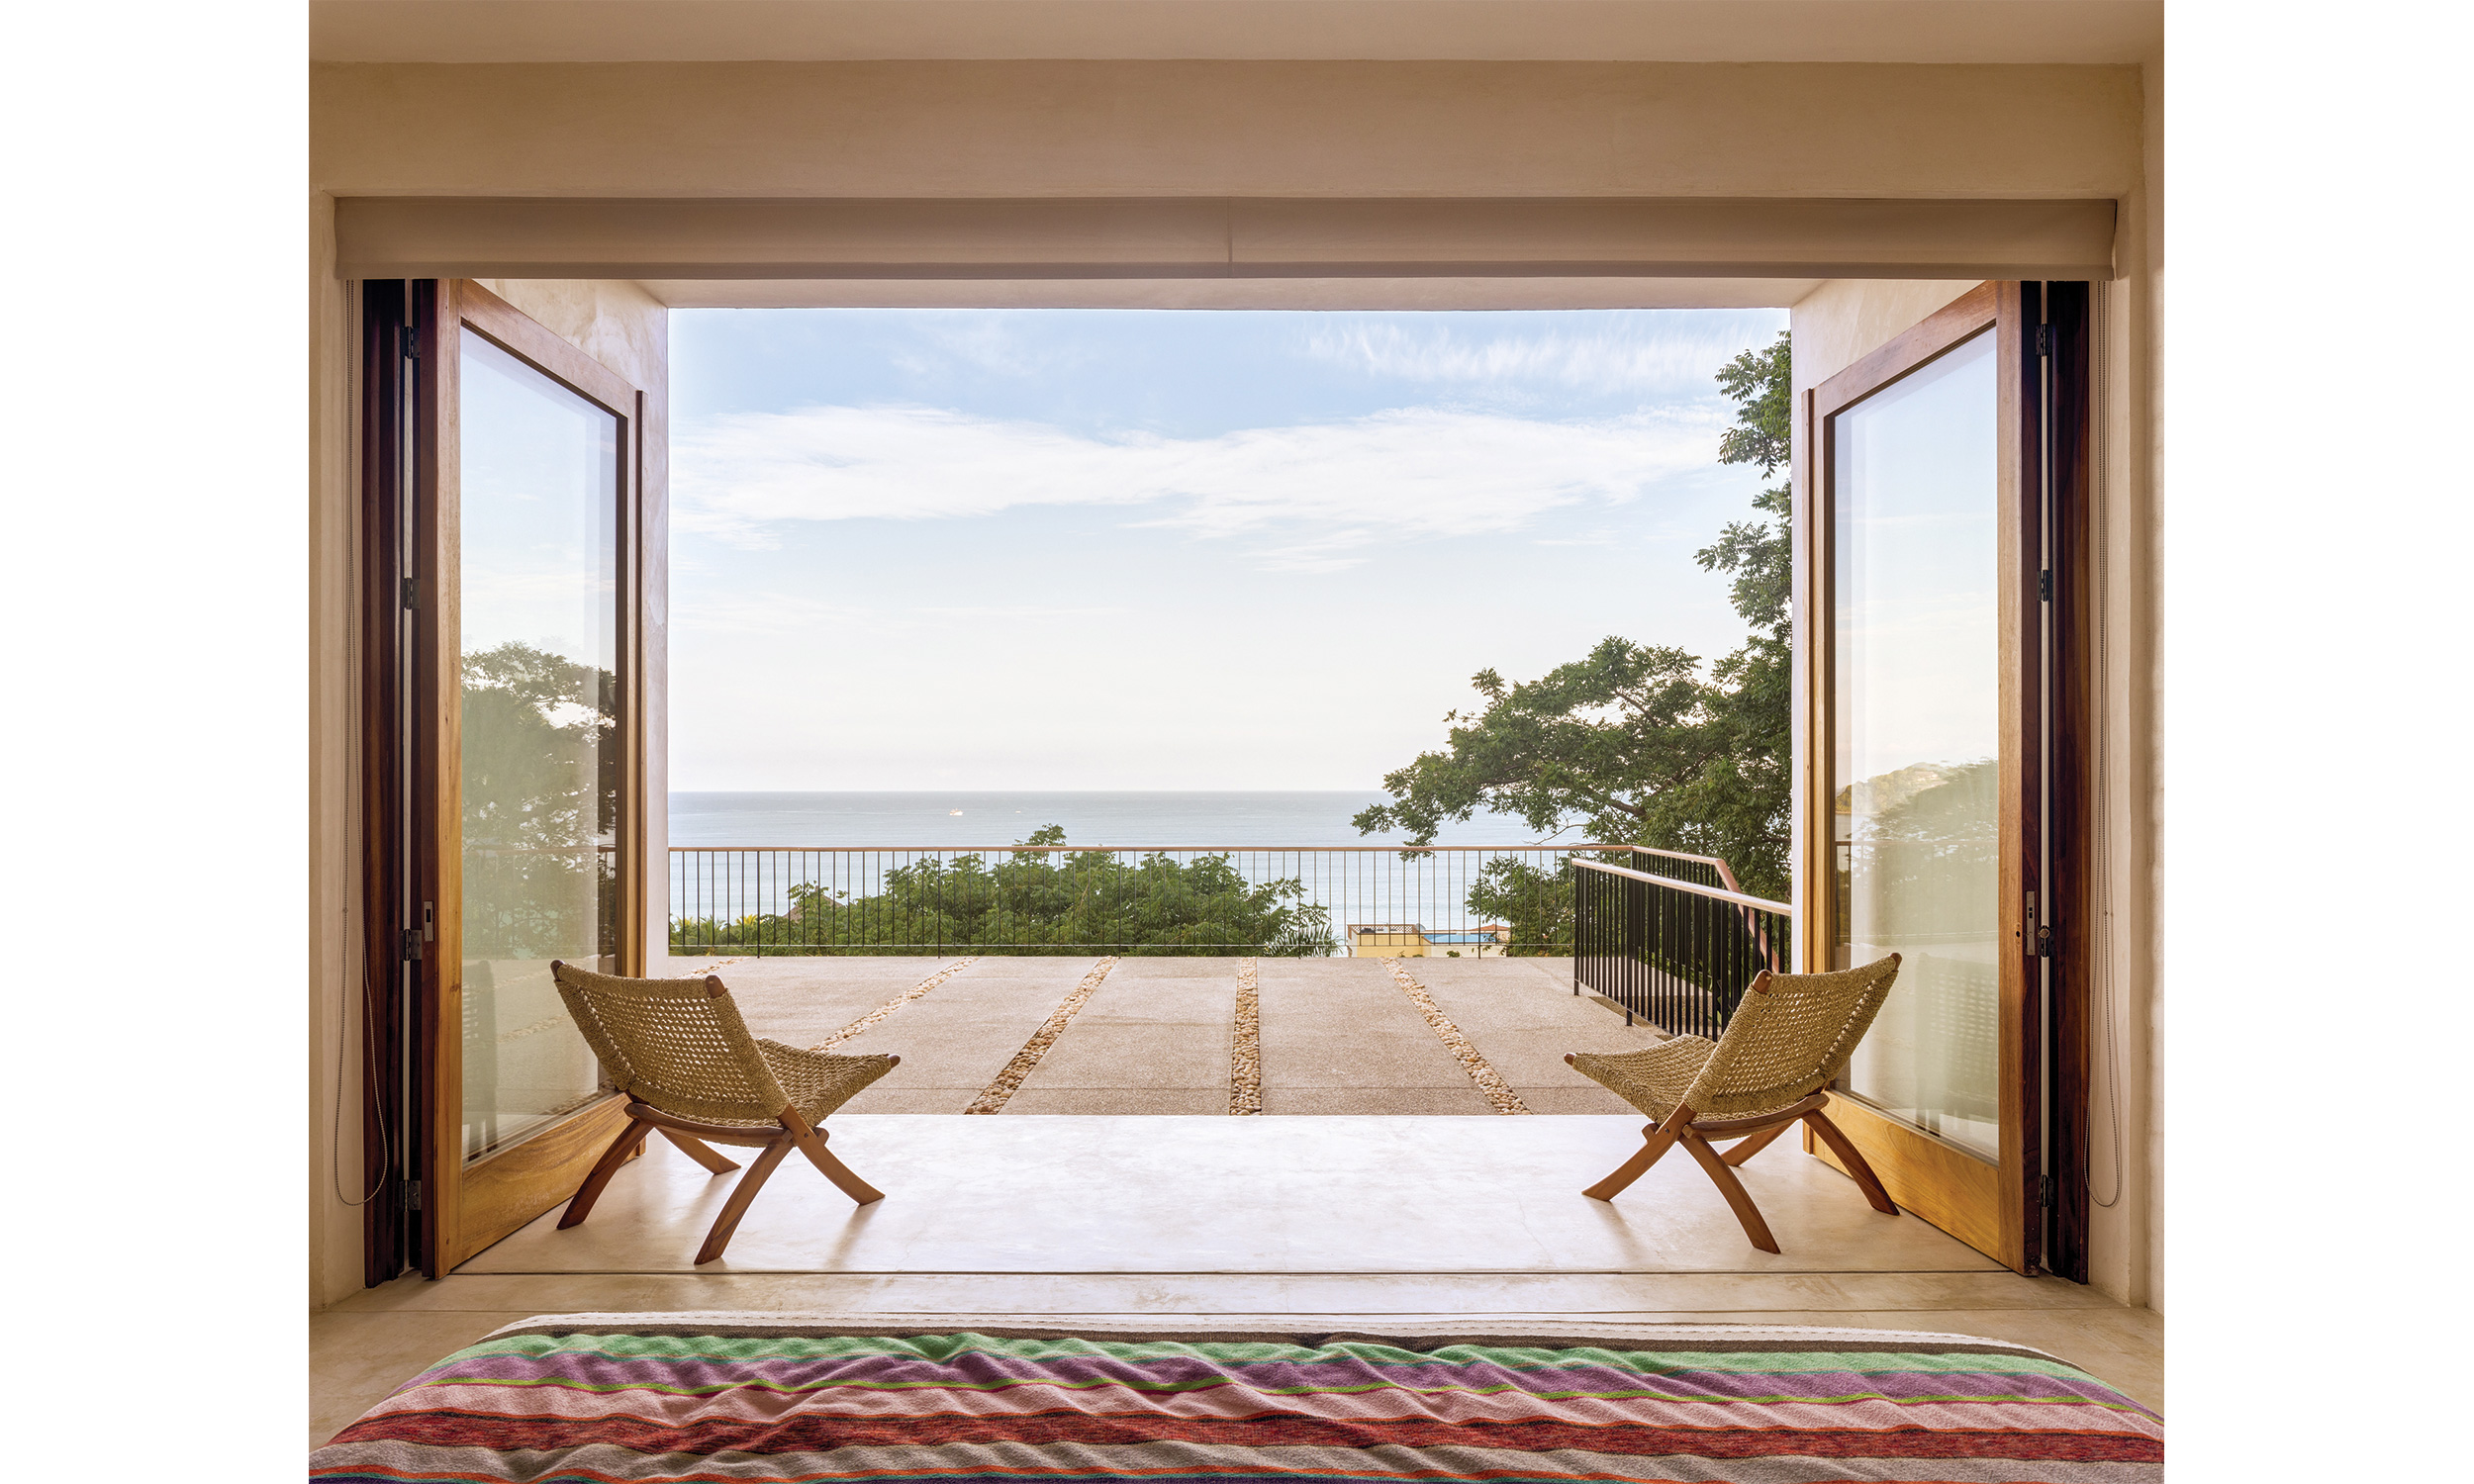 main_office_casa_reavis_rafaél_gamo_0578_terrace_view